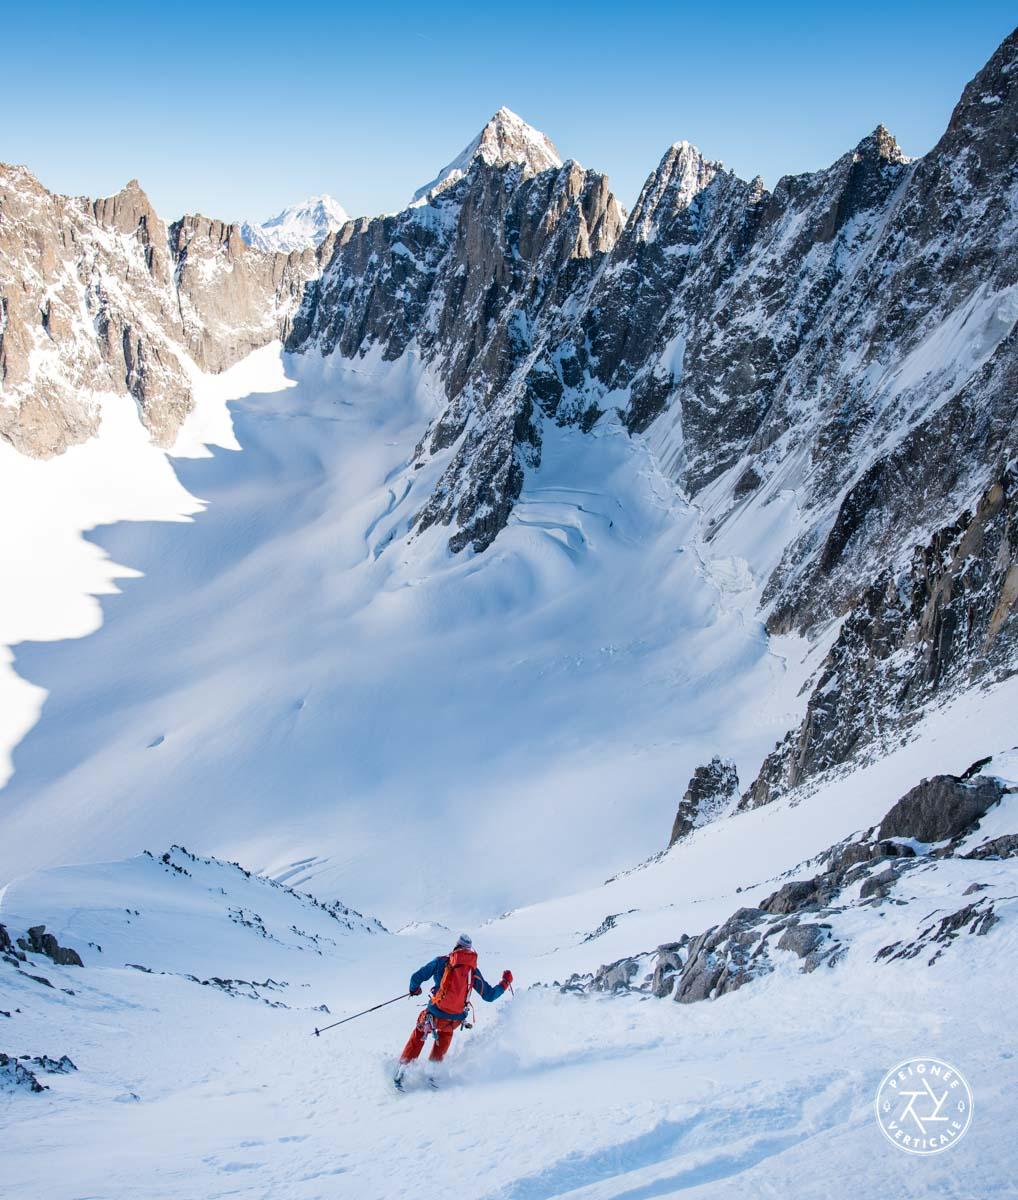 Virage sauté en pente raide en ski